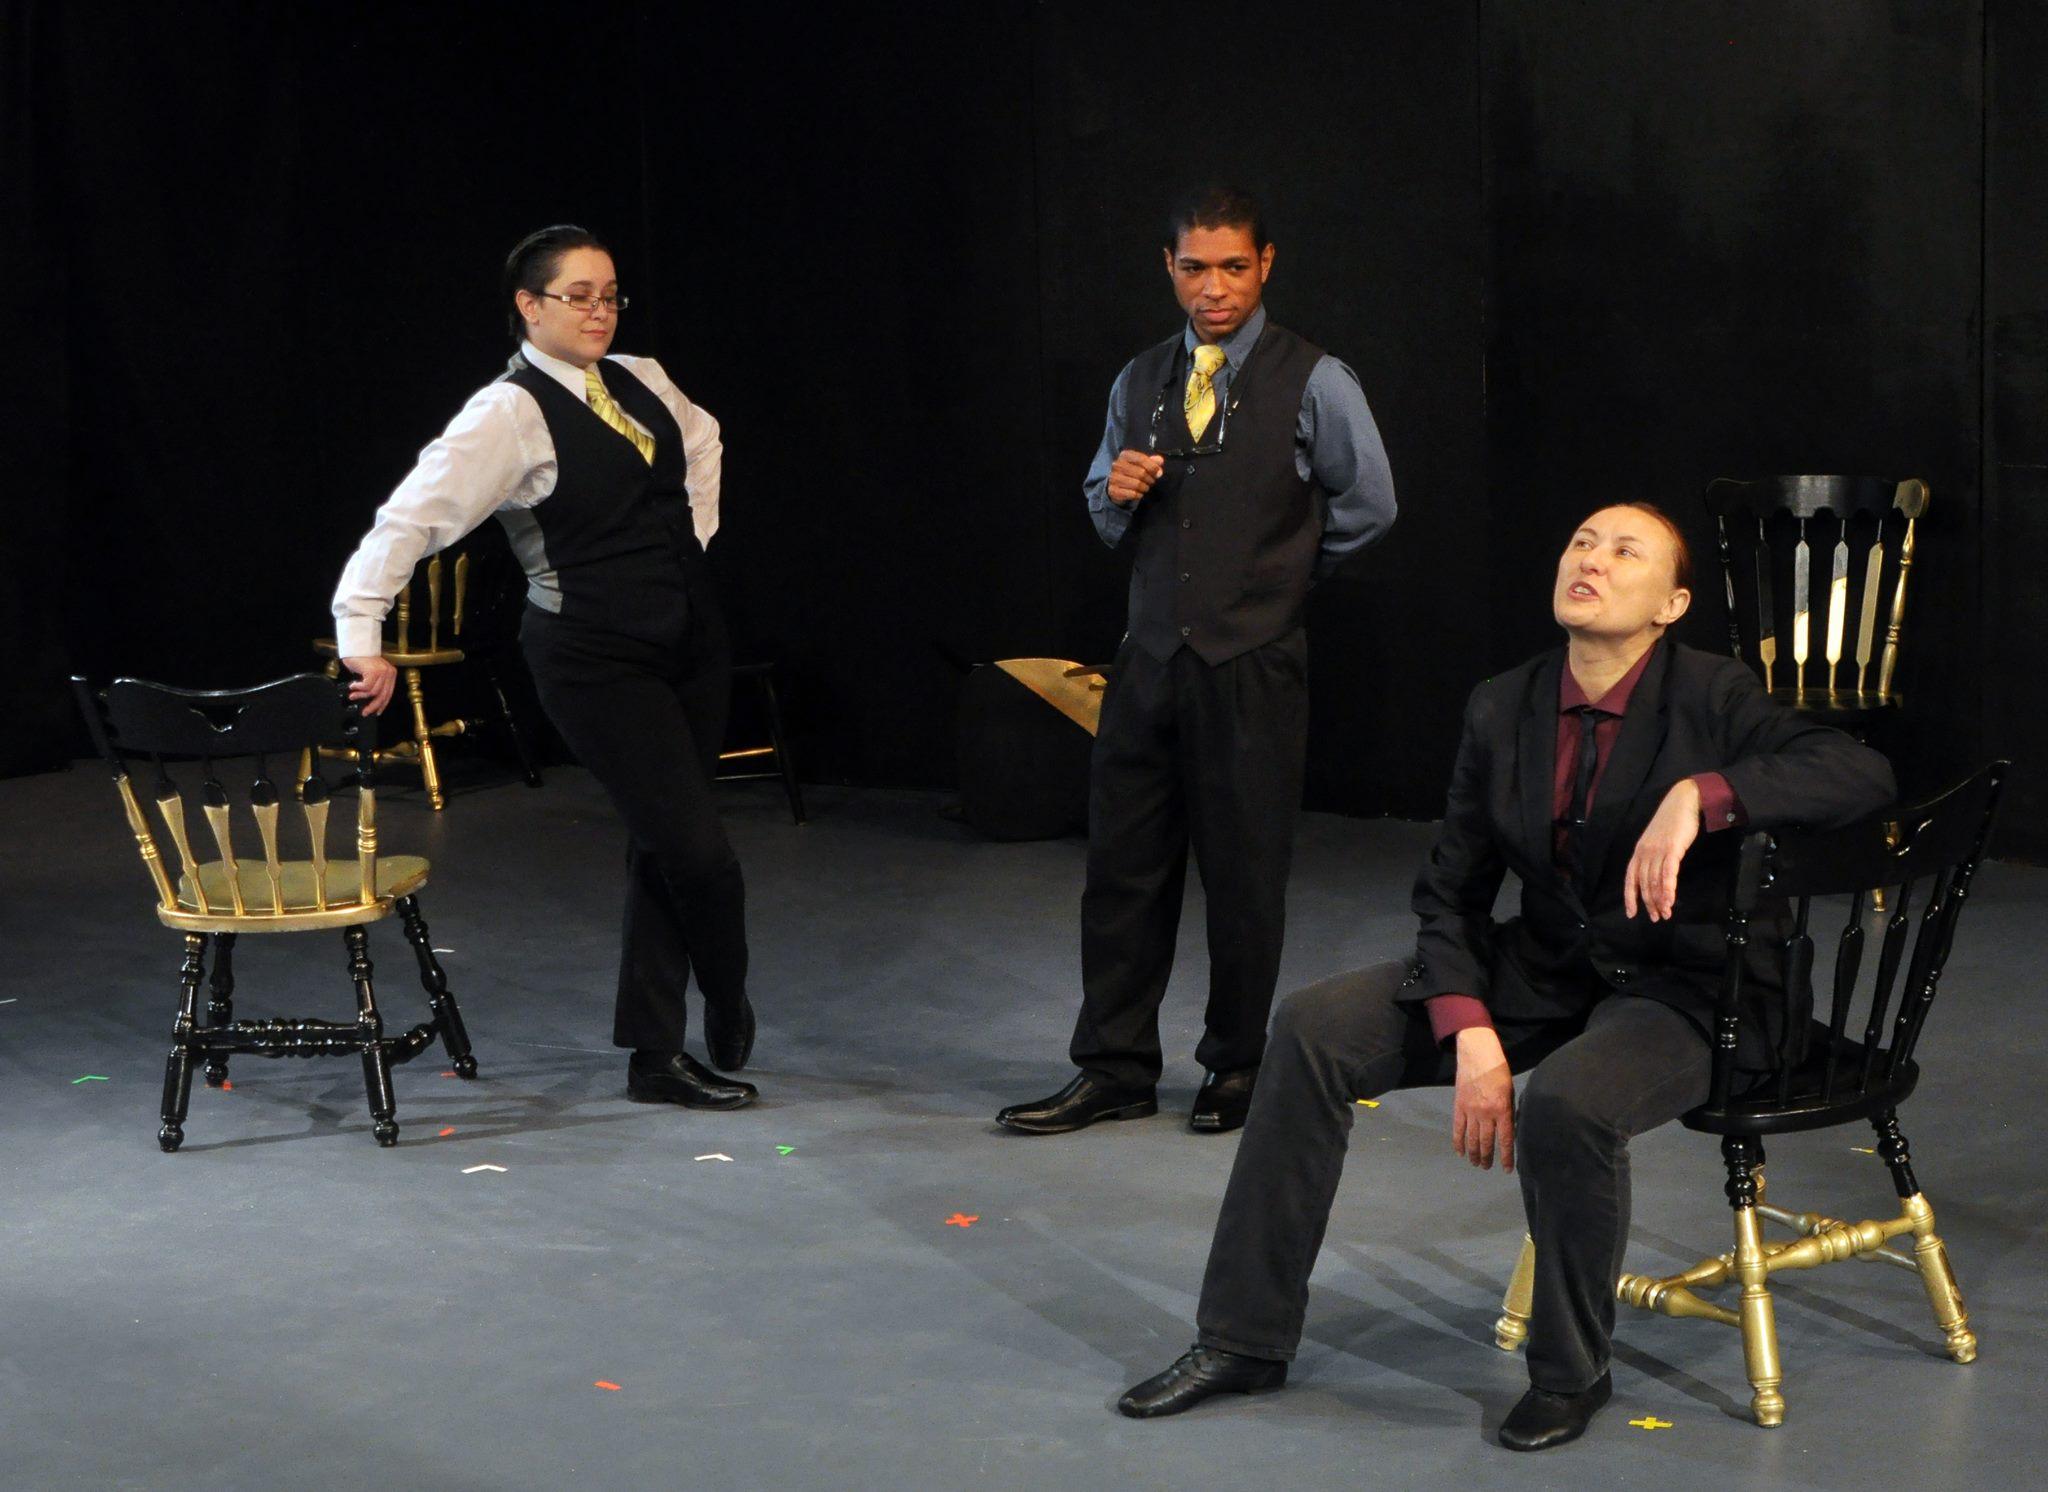 The Merchant of Venice, presented by The Rude Mechanicals, plays through June 30 at the Greenbelt Arts Center. Photo by Rachel Zirkin Duda.